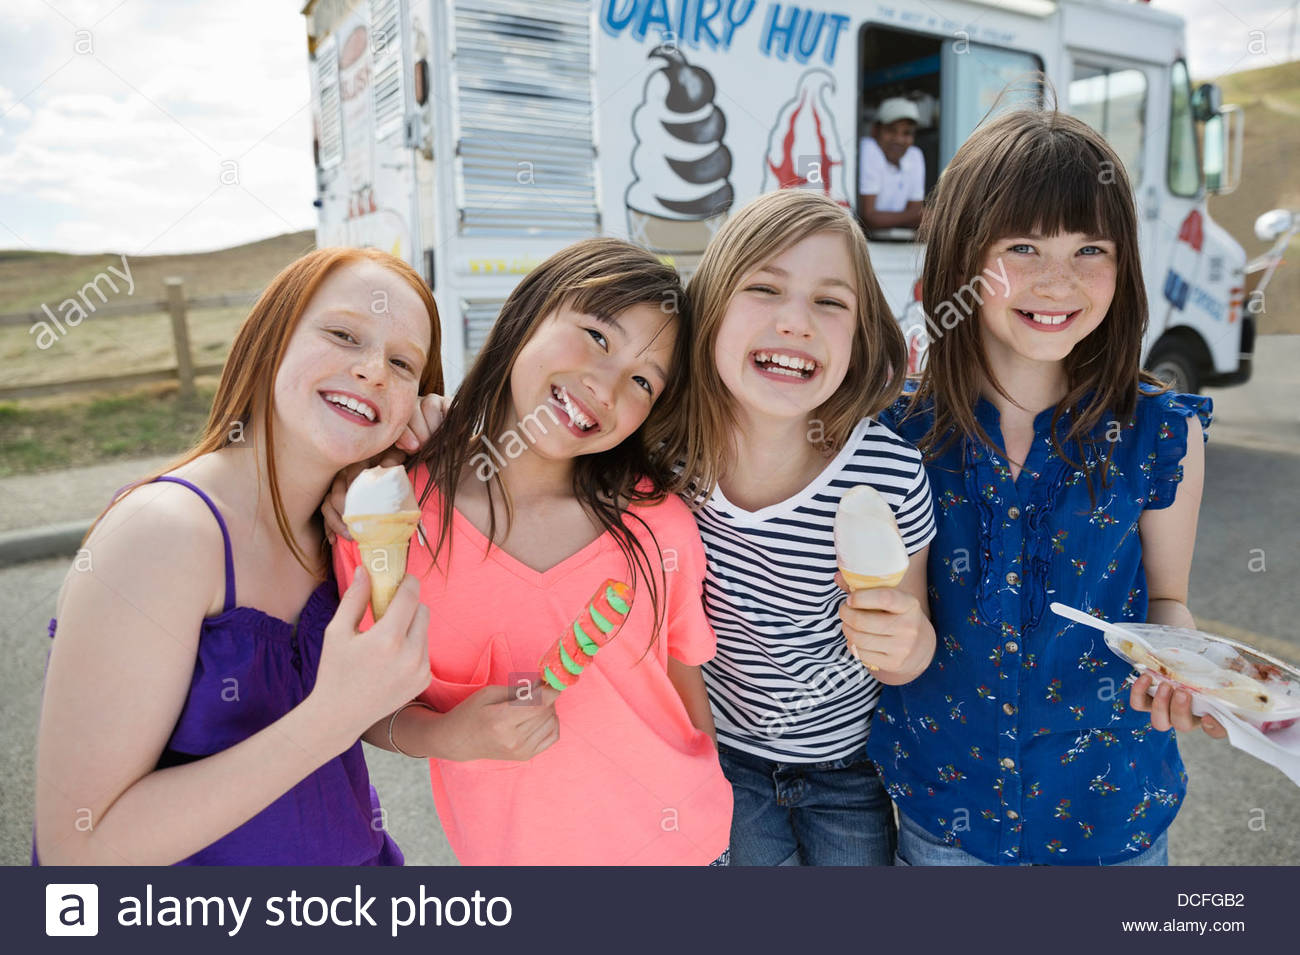 Portrait of cheerful little girls holding frozen treats - Stock Image